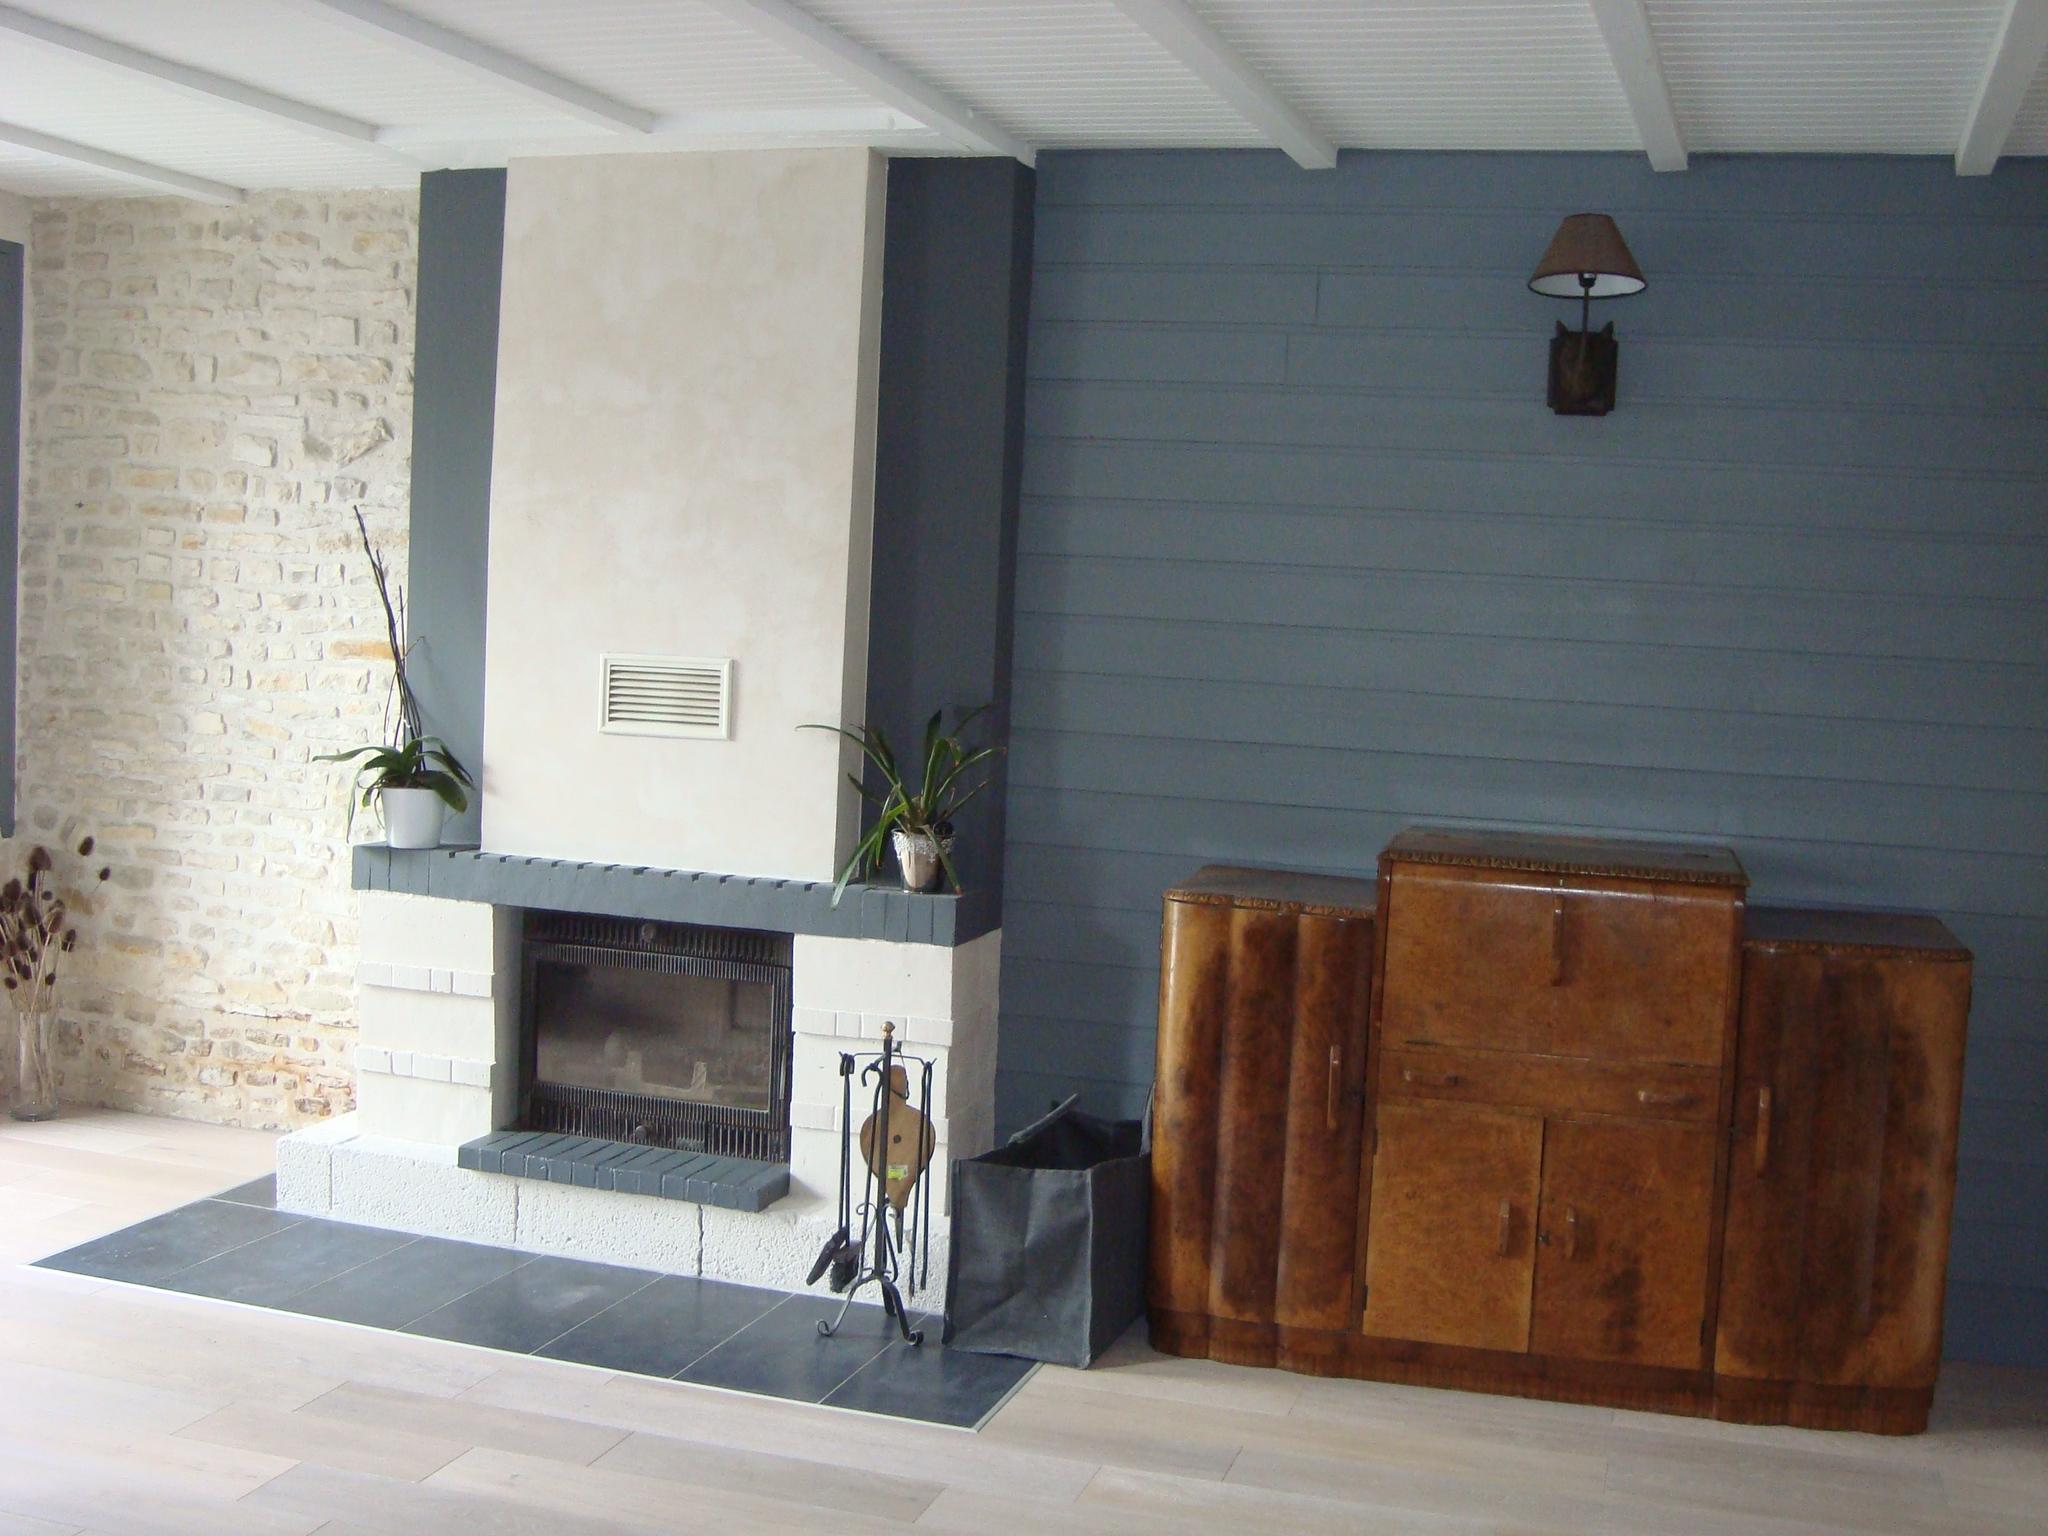 chemine en brique peindre cheminee en pierre photo et peinture cheminee en brique peindre gris. Black Bedroom Furniture Sets. Home Design Ideas